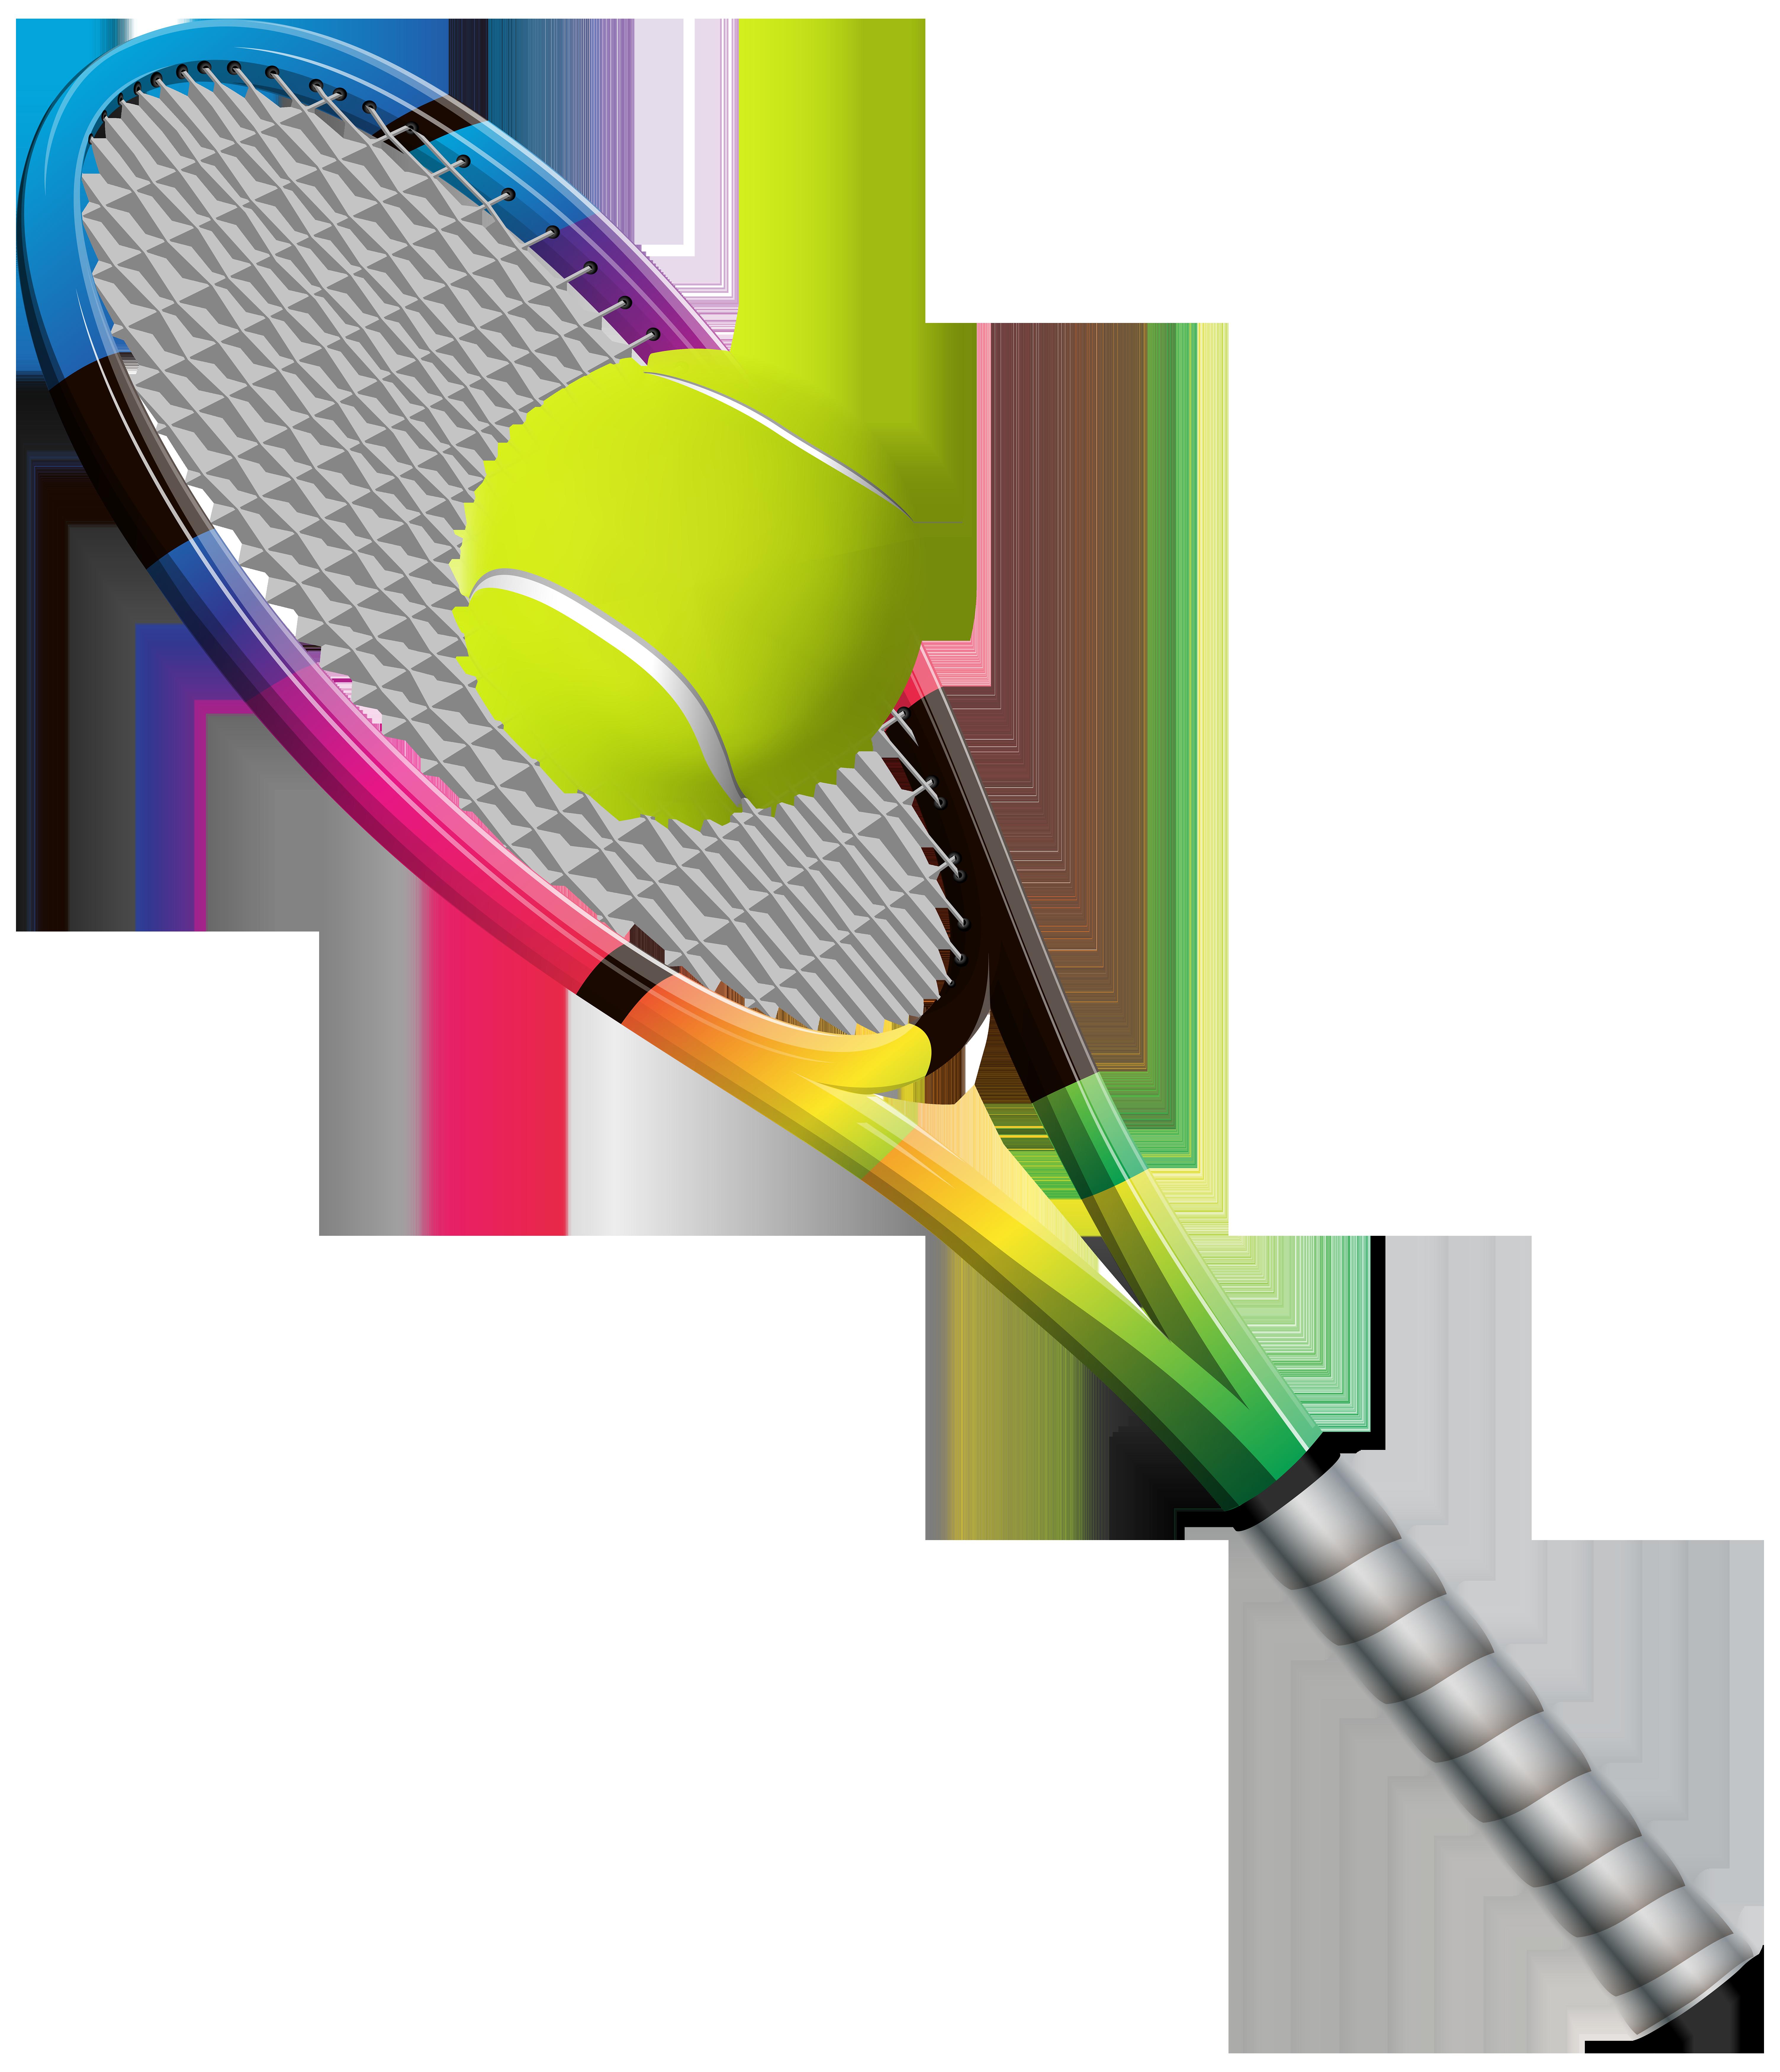 Racket and ball transparent. Clipart rocket tennis